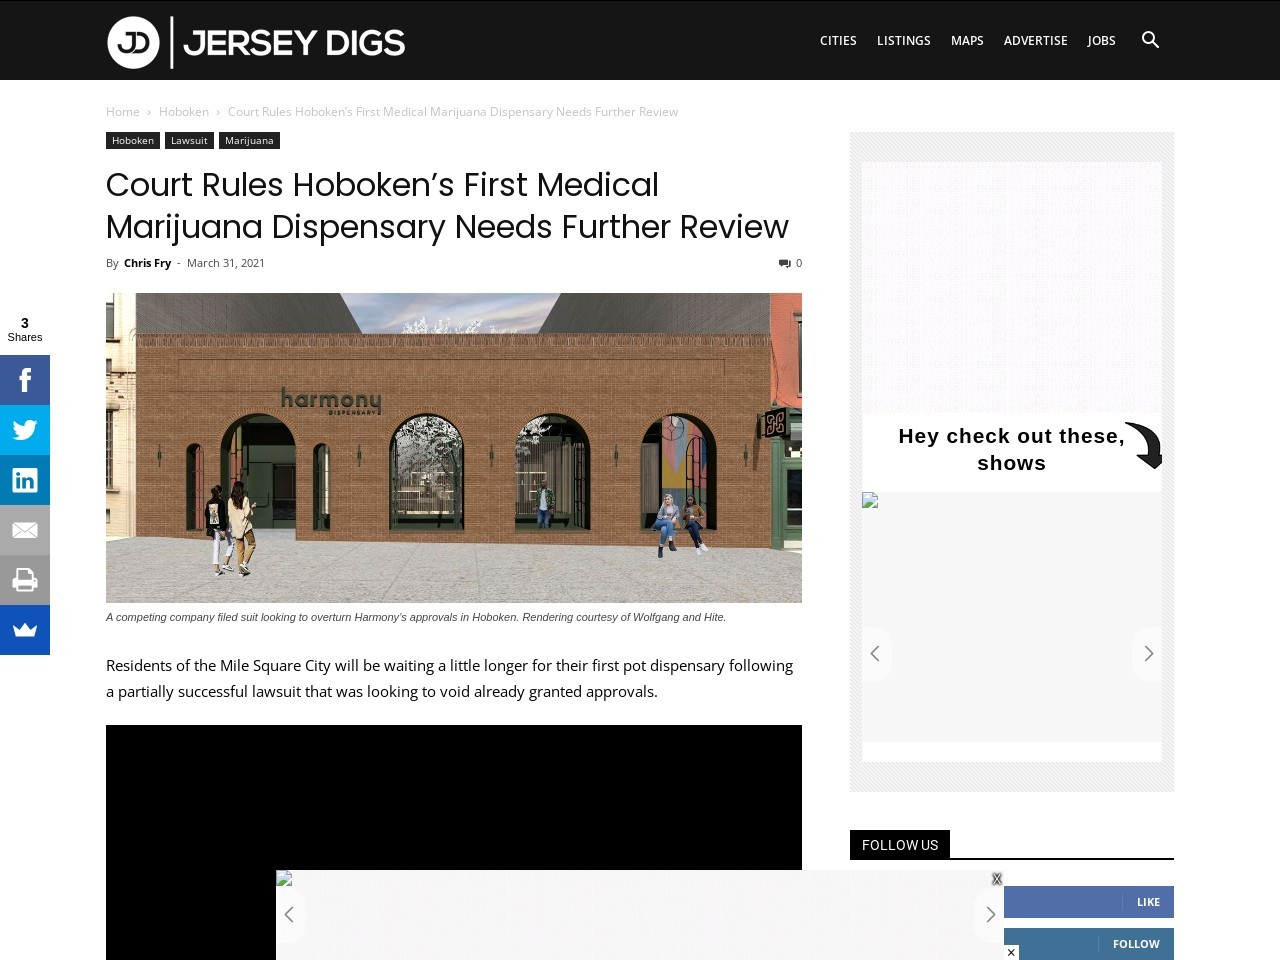 Court Rules Hoboken's First Medical Marijuana Dispensary Needs Further Review